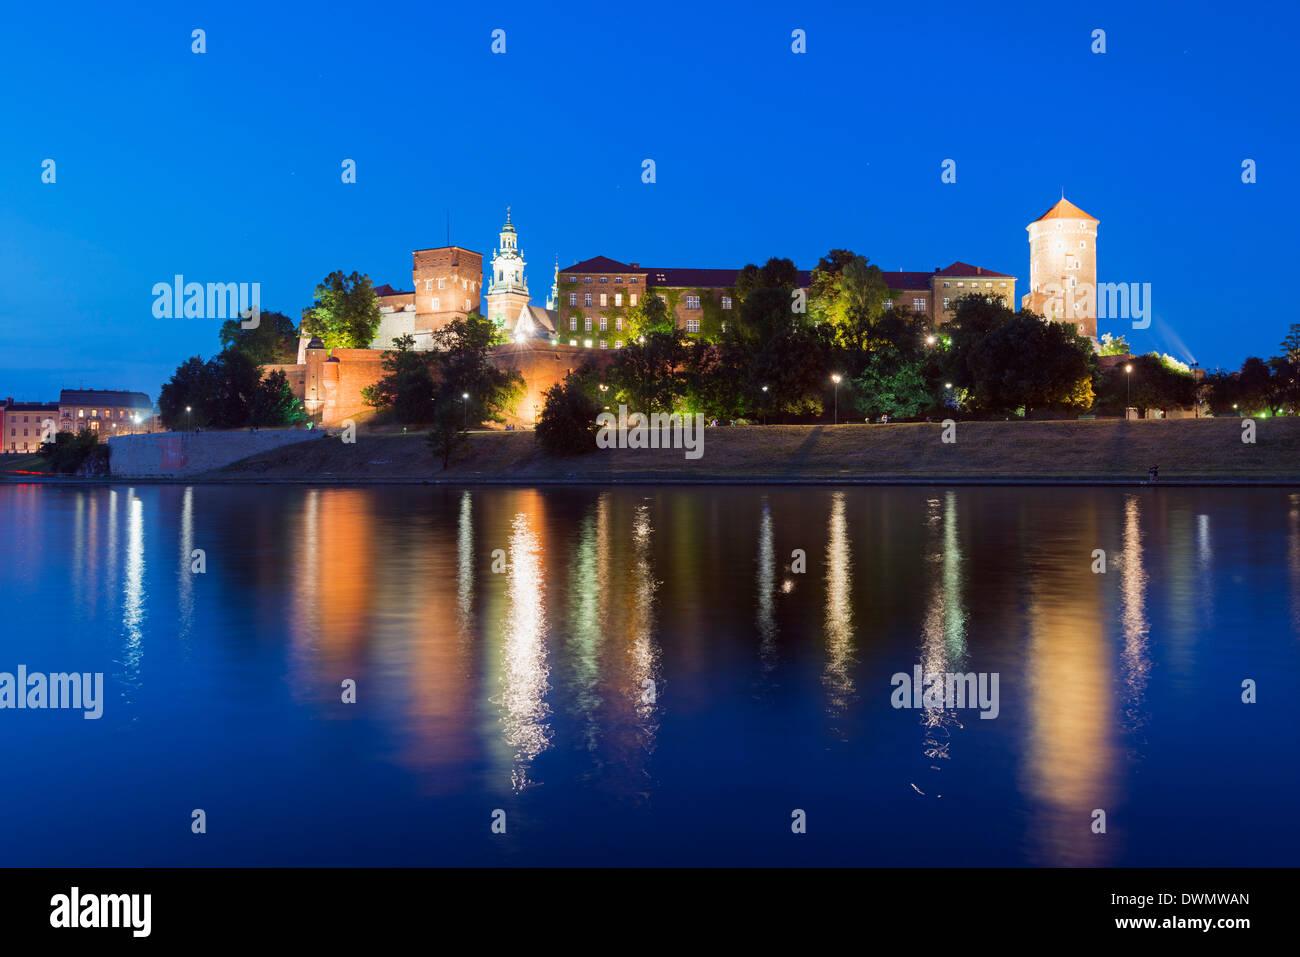 Wawel Hill Castle and Cathedral, Vistula River, UNESCO World Heritage Site, Krakow, Malopolska, Poland, Europe - Stock Image